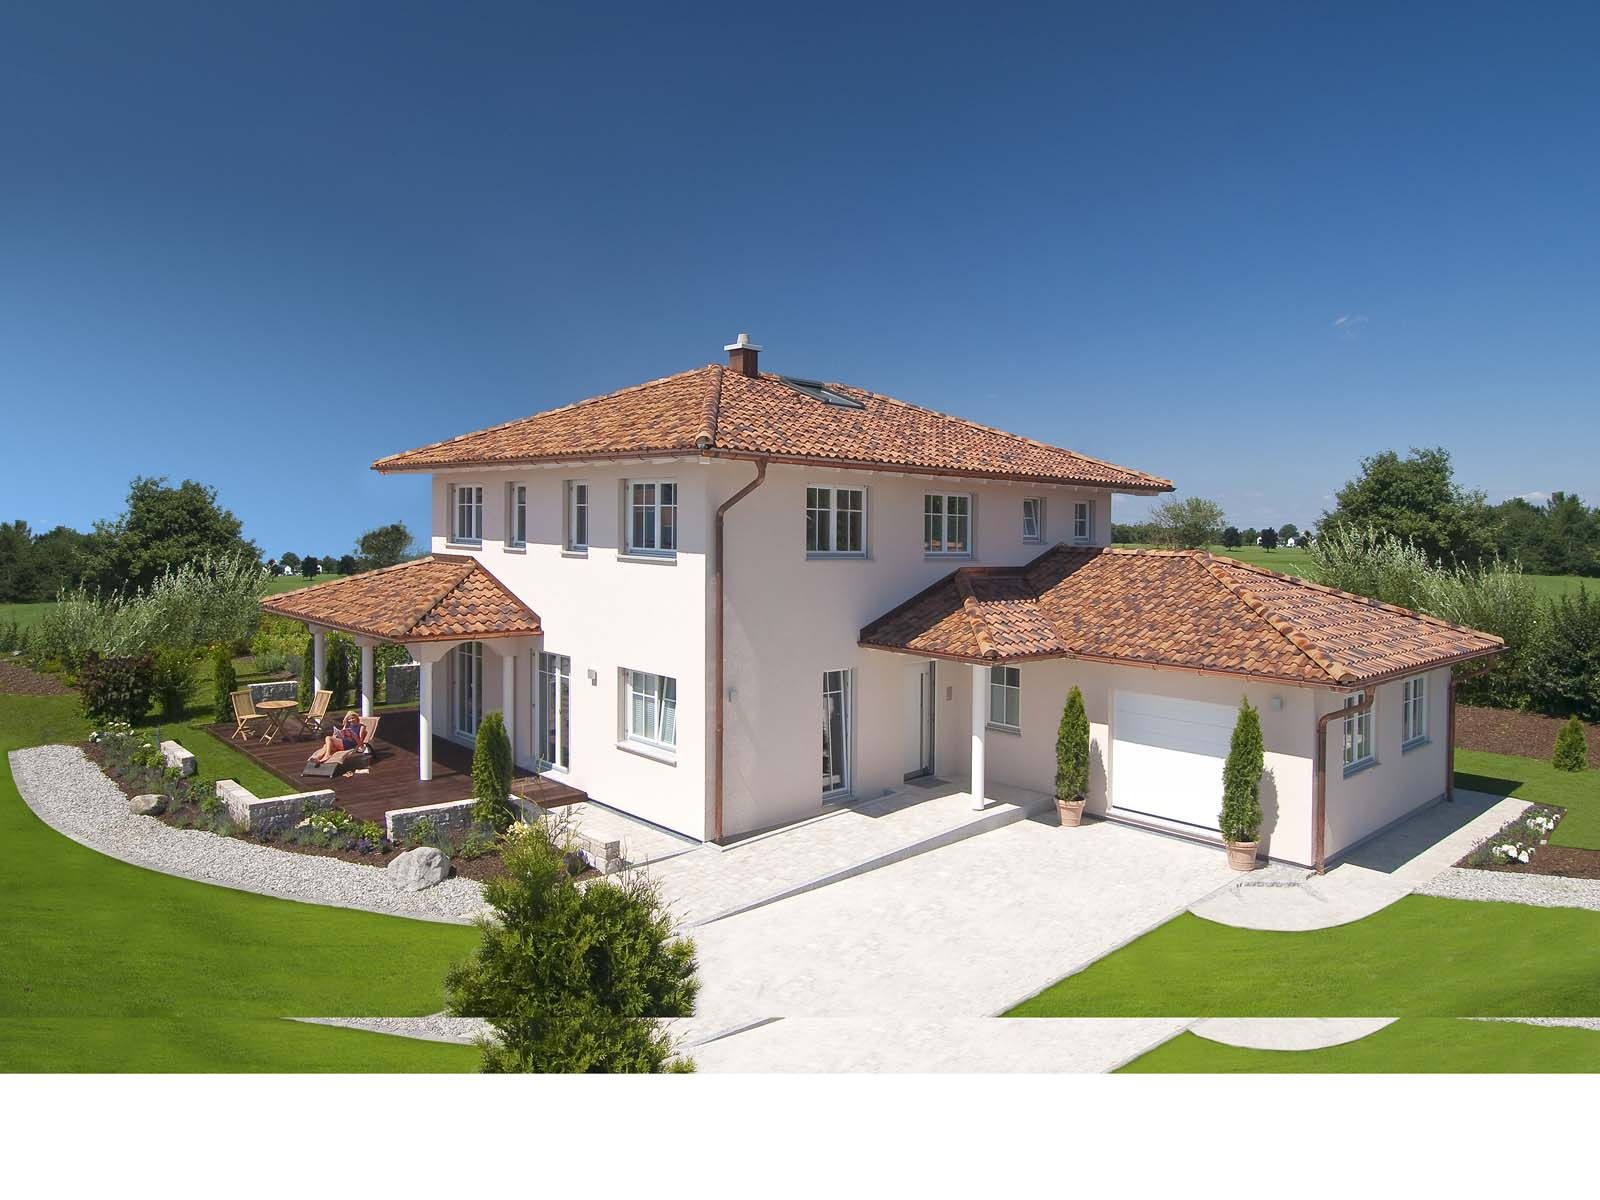 Villa landhaus modern  Projekt Domu Riwiera | General | Pinterest